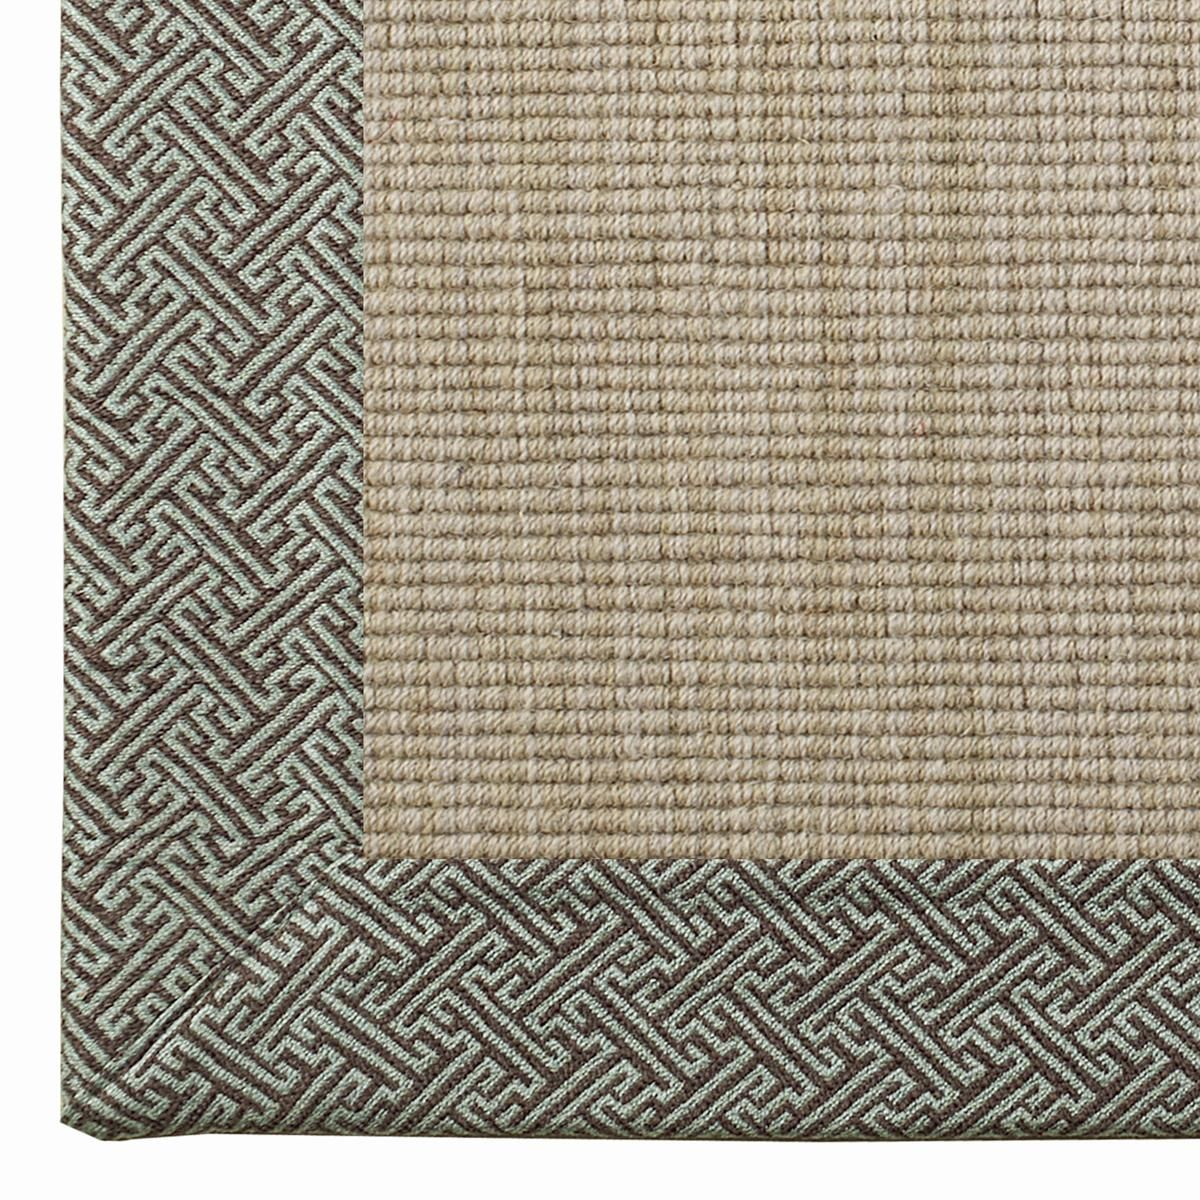 Geometric Border Wool Sisal Rug 4 Colors For The Home